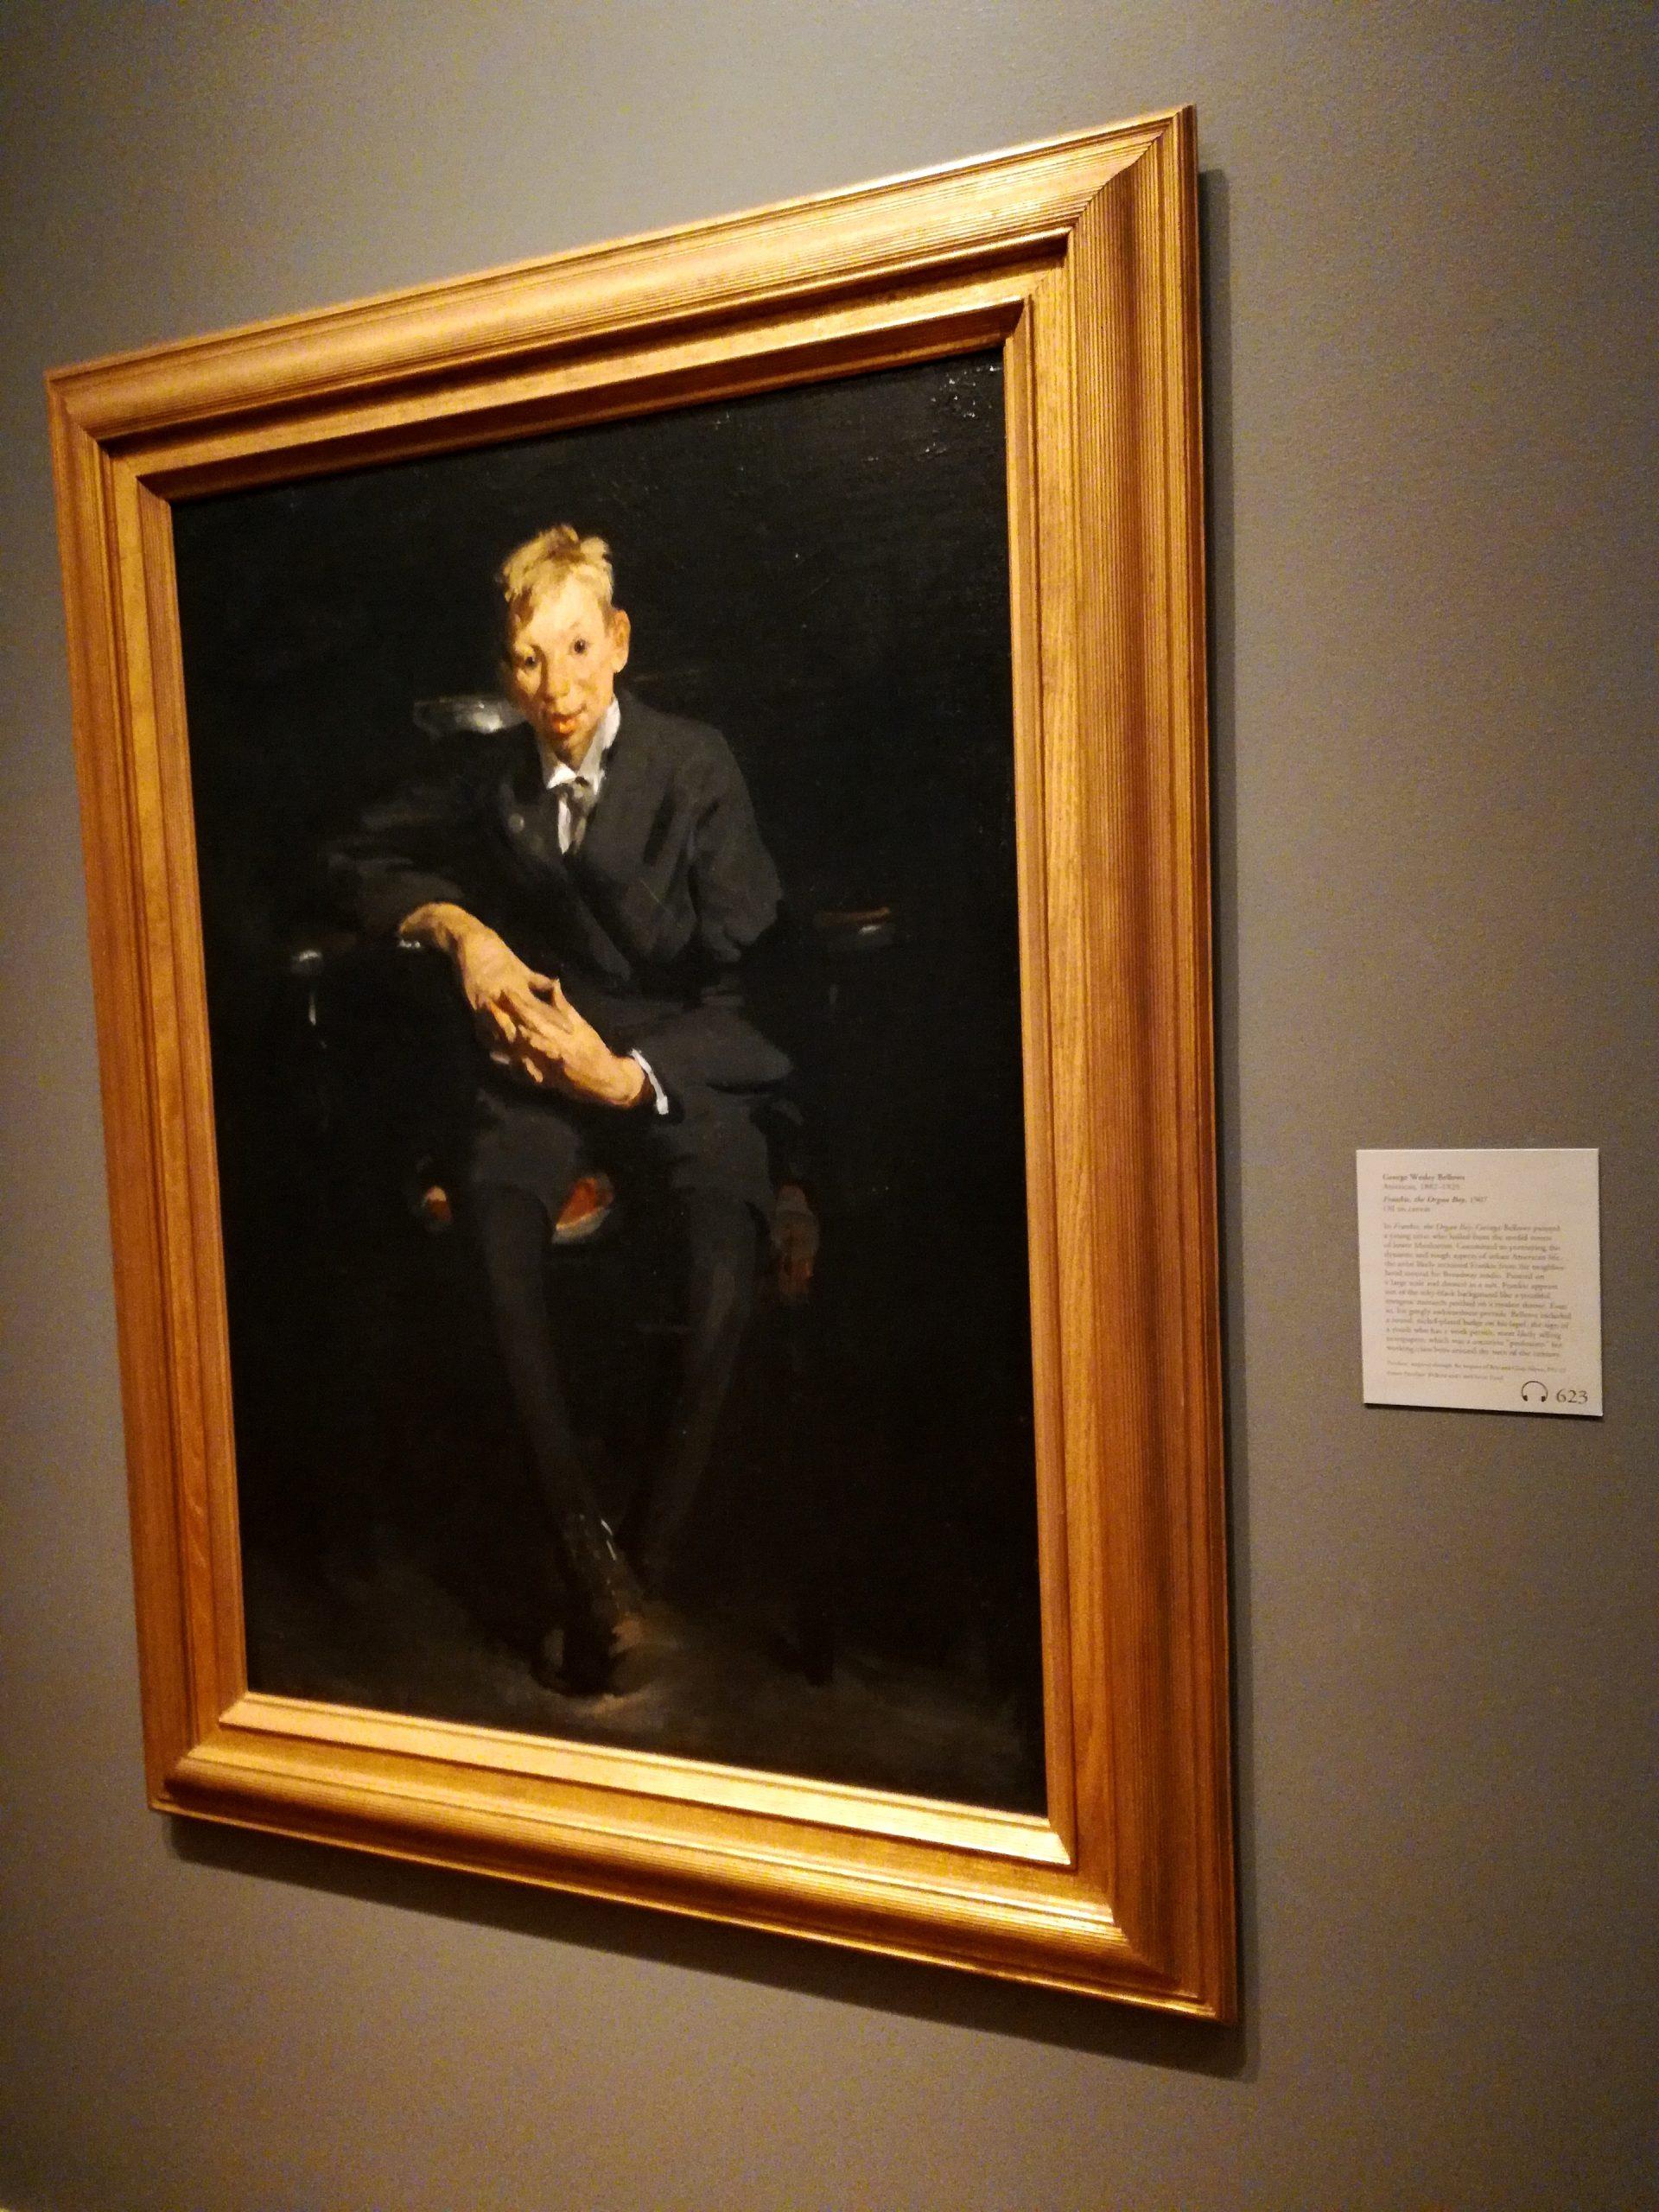 George Wesley Bellows Frankie the Organ Boy Nelson-Atkins Museum of Art Kansas City KCMO